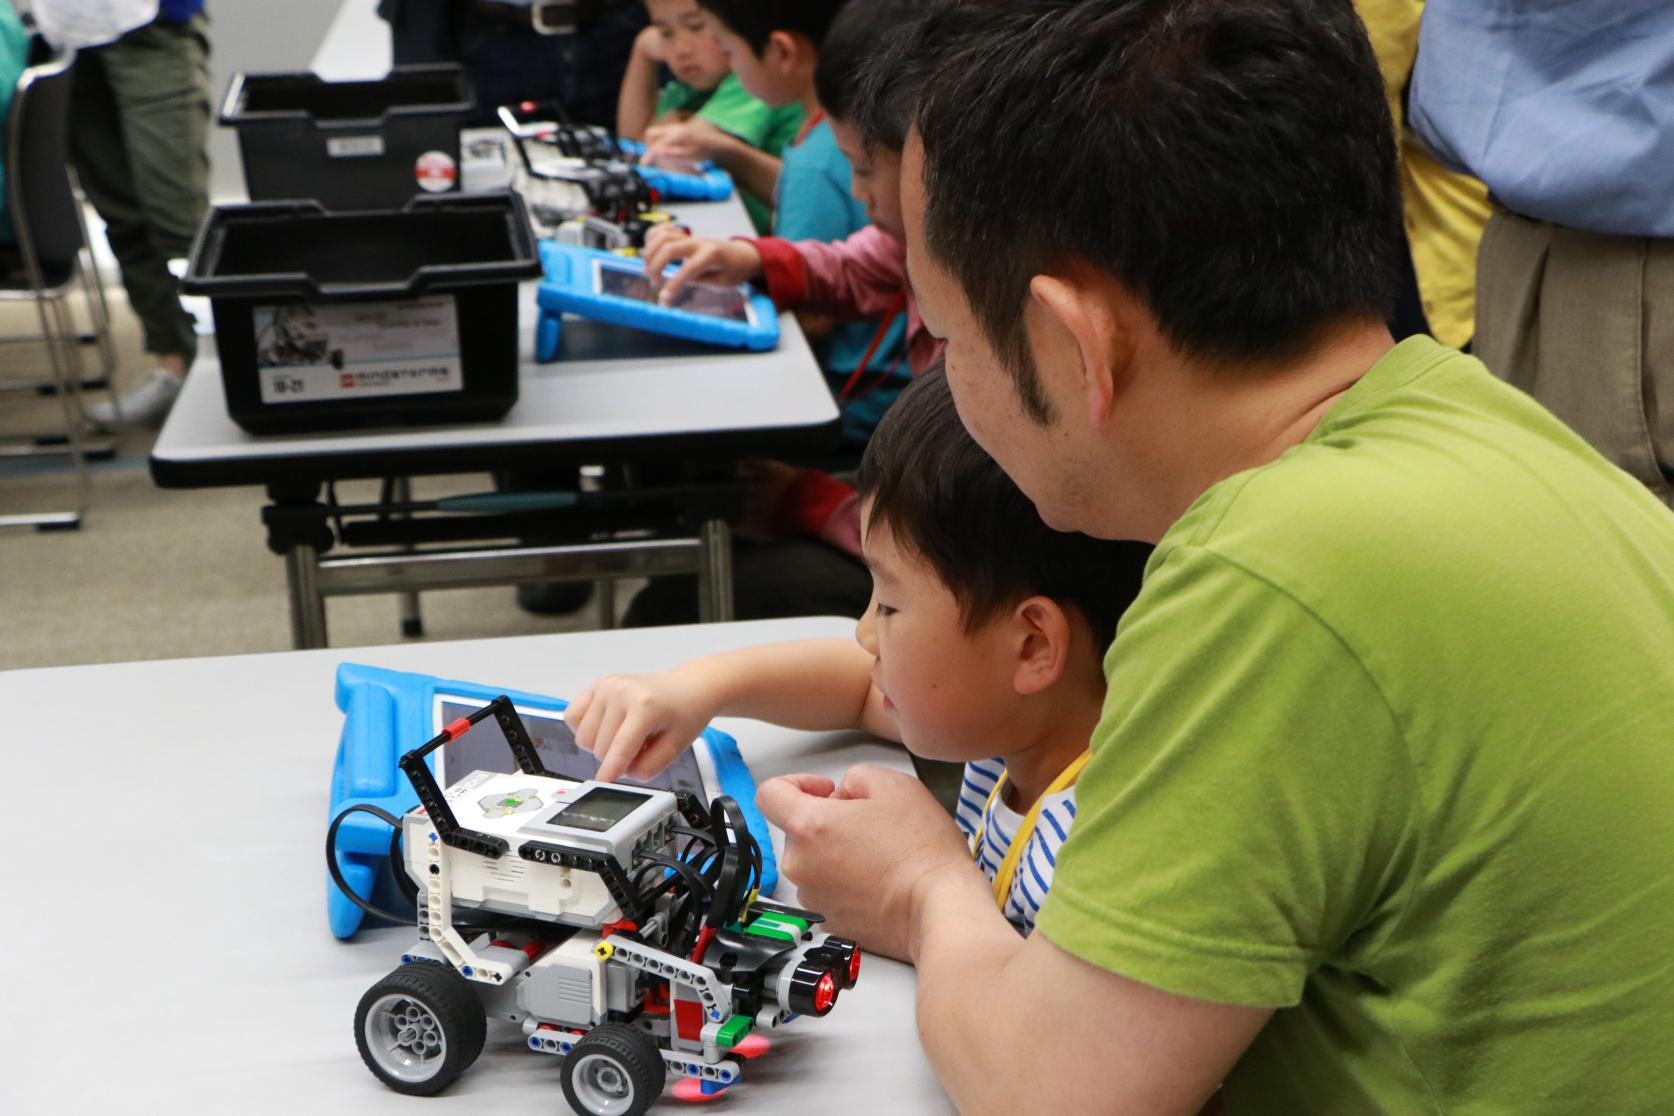 J:COMチャンネル「デイリーニュース 船橋 習志野 八千代」5月15日(火)放送:機械工学科の「くるま未来体験教室」の模様が放送されます。